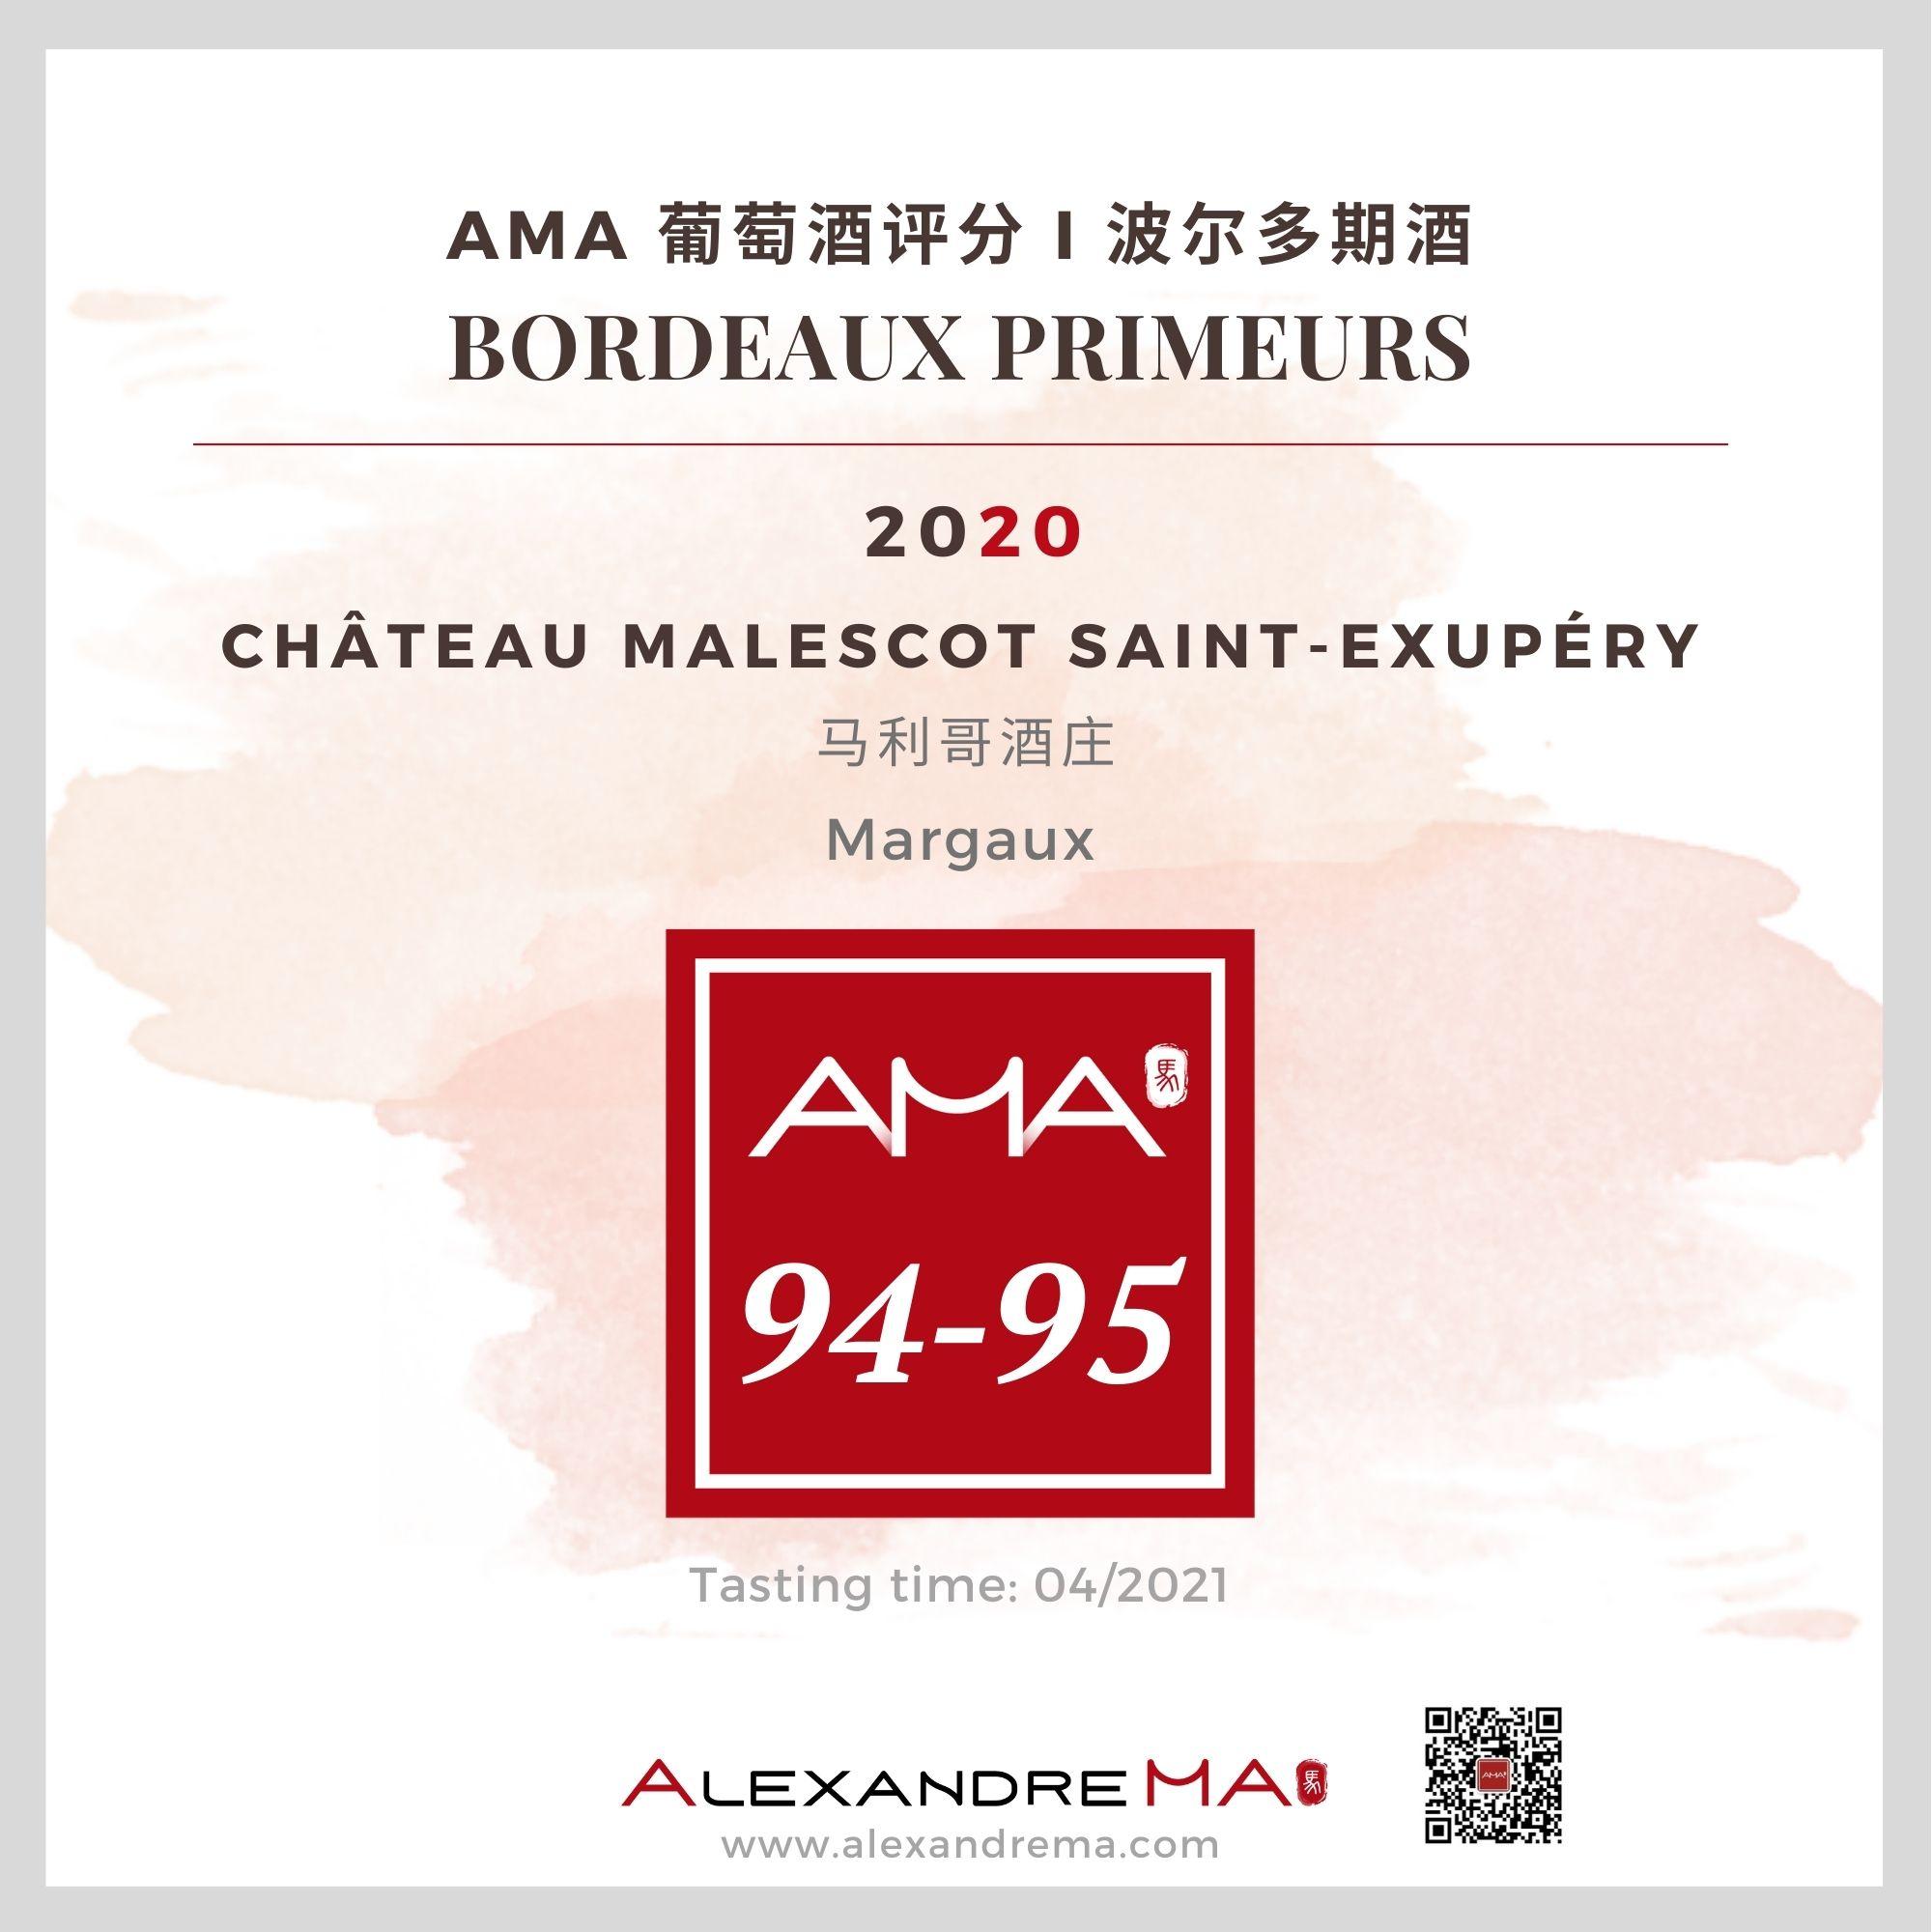 Château Malescot Saint-Exupéry 2020 - Alexandre MA